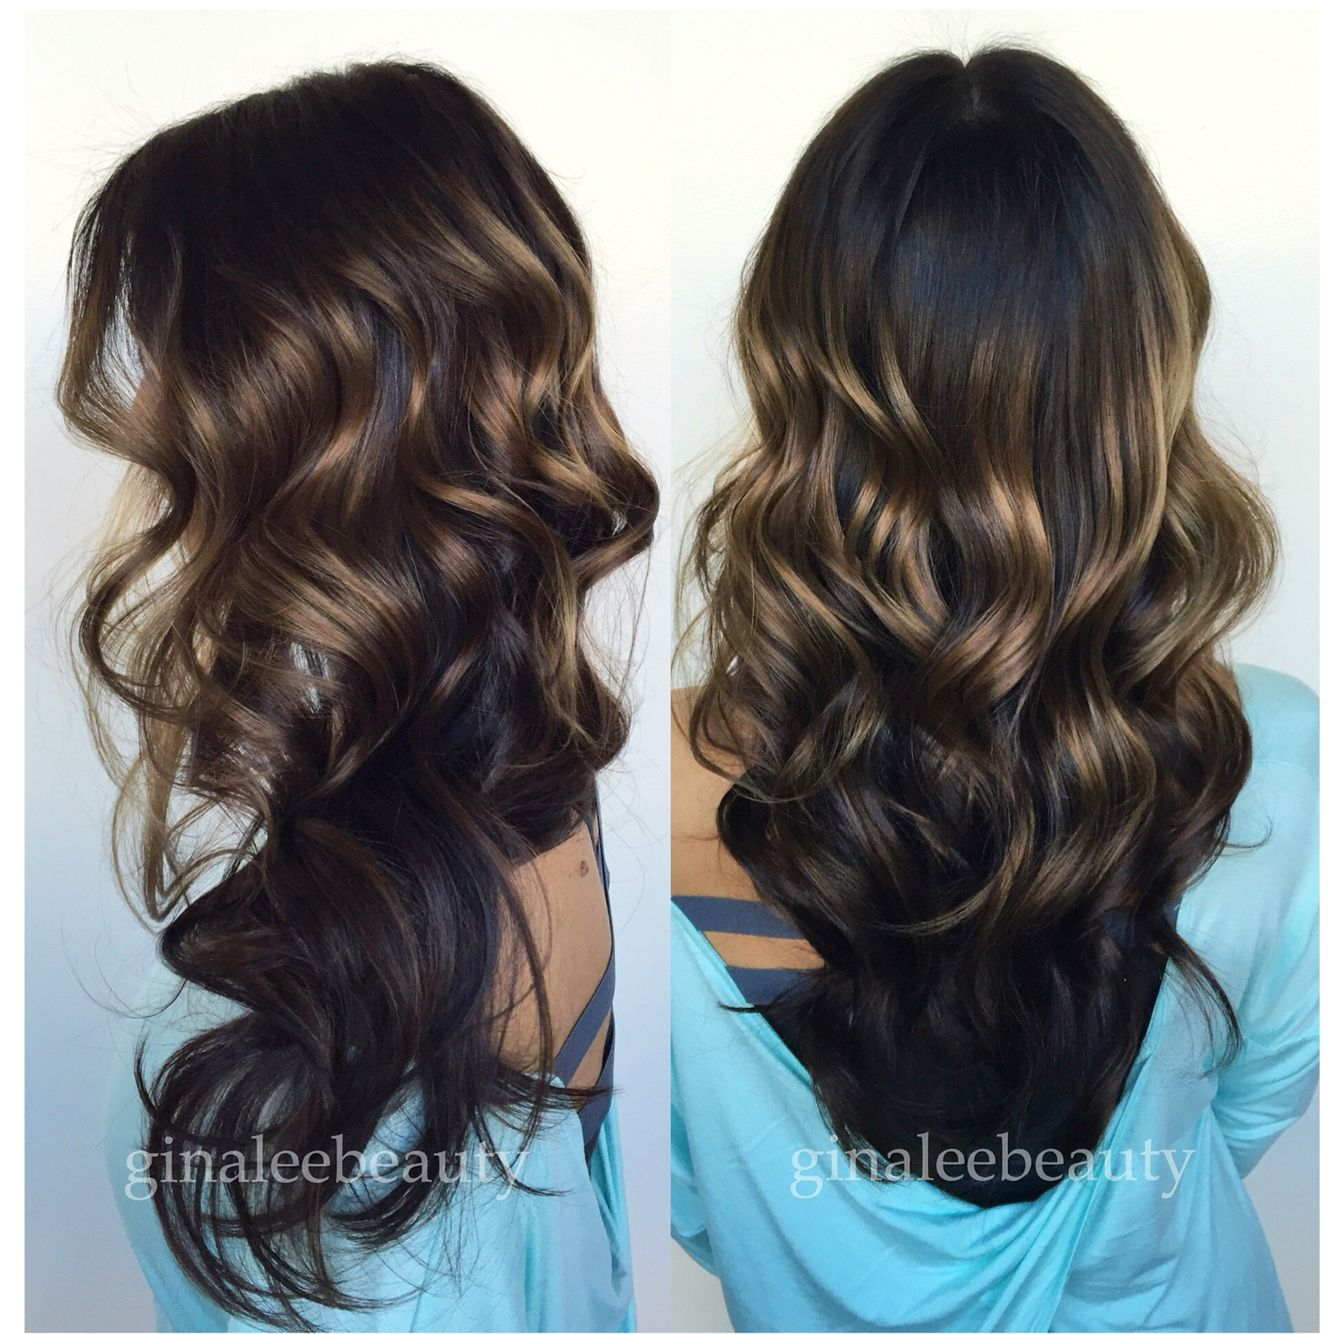 Sunkissed balayage highlights on dark brown hair ginaleebeauty sunkissed balayage highlights on dark brown hair ginaleebeauty pmusecretfo Images